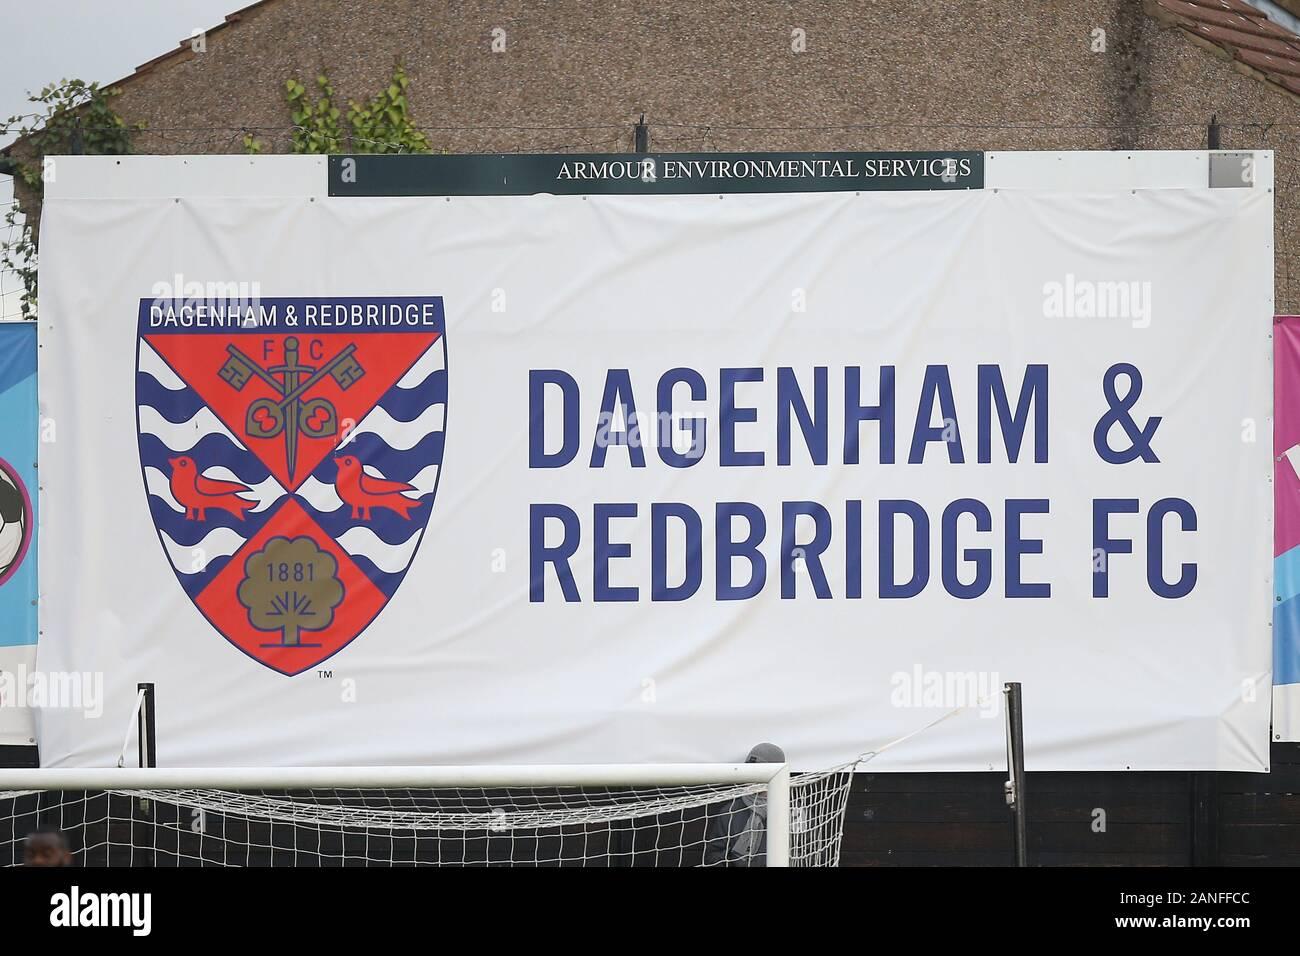 Dagenham & Redbridge FC signage during Dagenham & Redbridge vs Maidenhead United, Vanarama National League Football at the Chigwell Construction Stadi Stock Photo